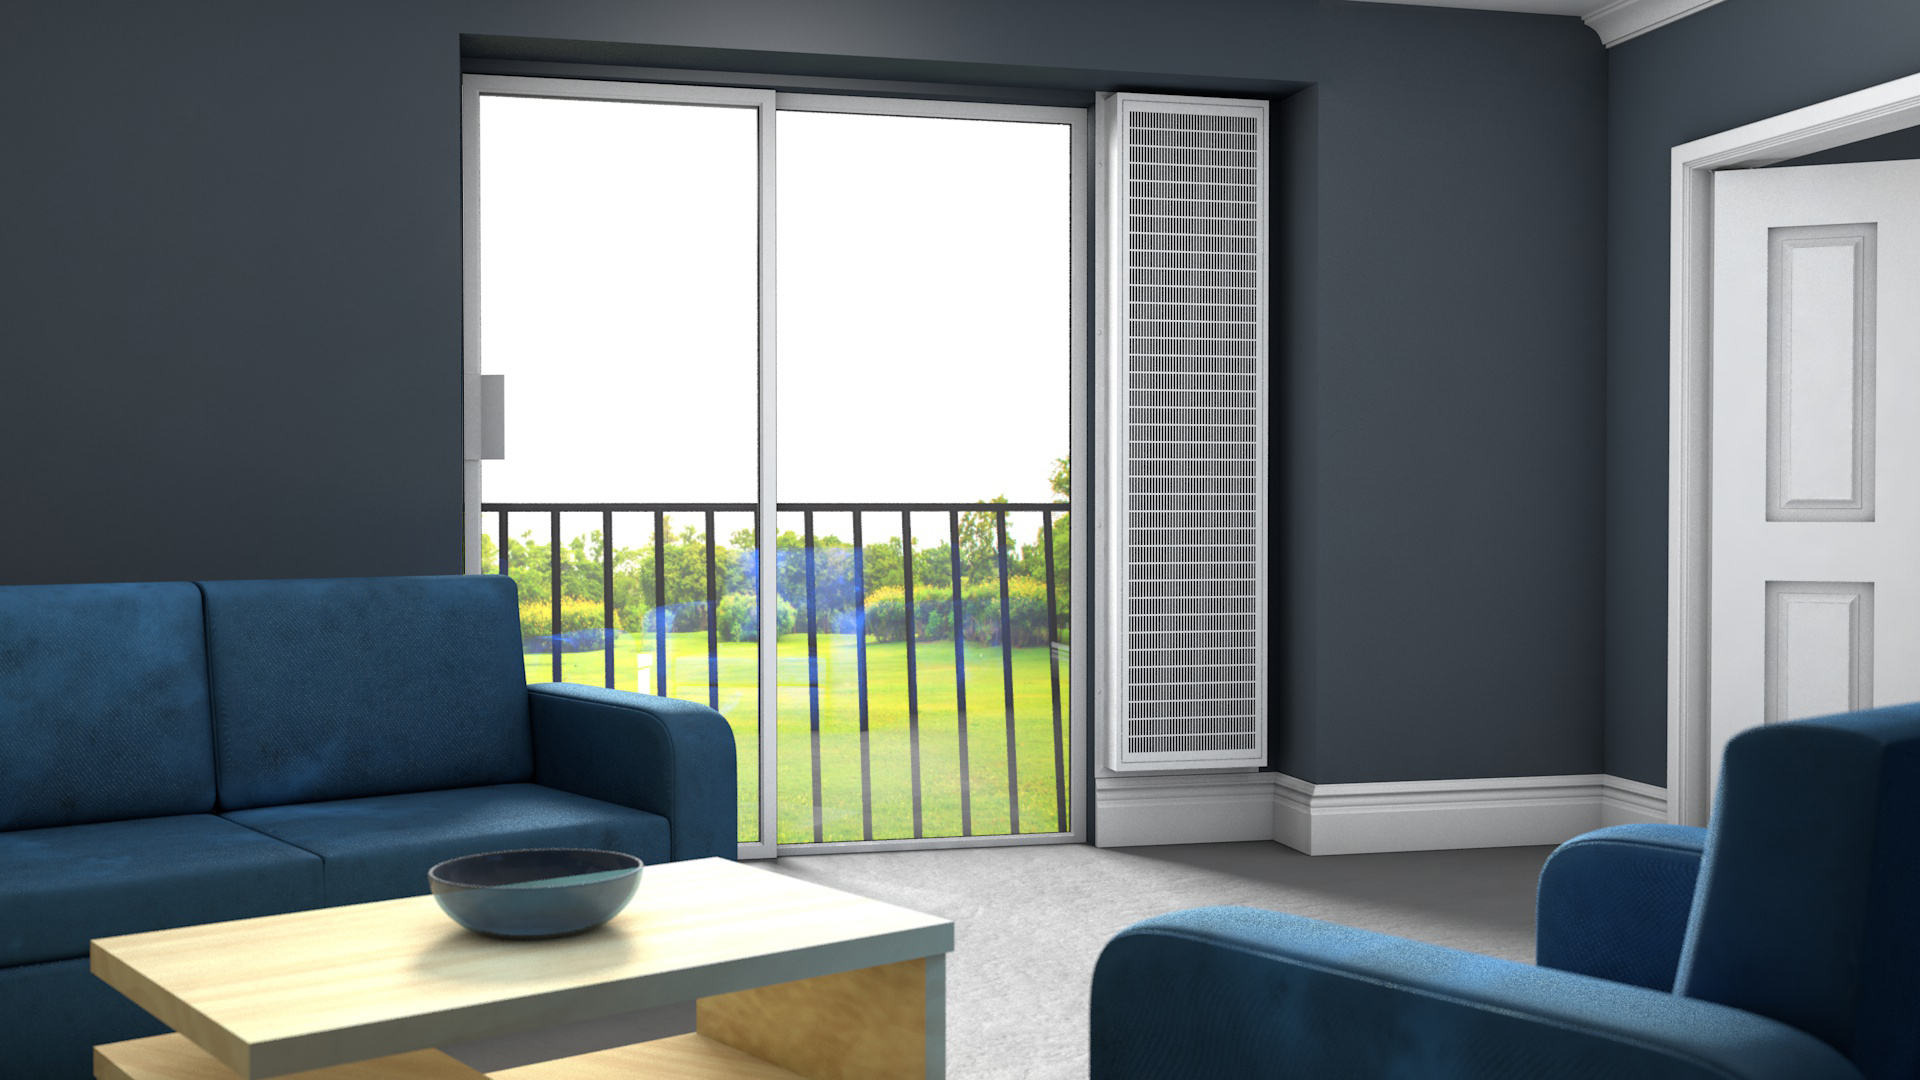 avo 02 - Residential Ventilation Unit - AVO2